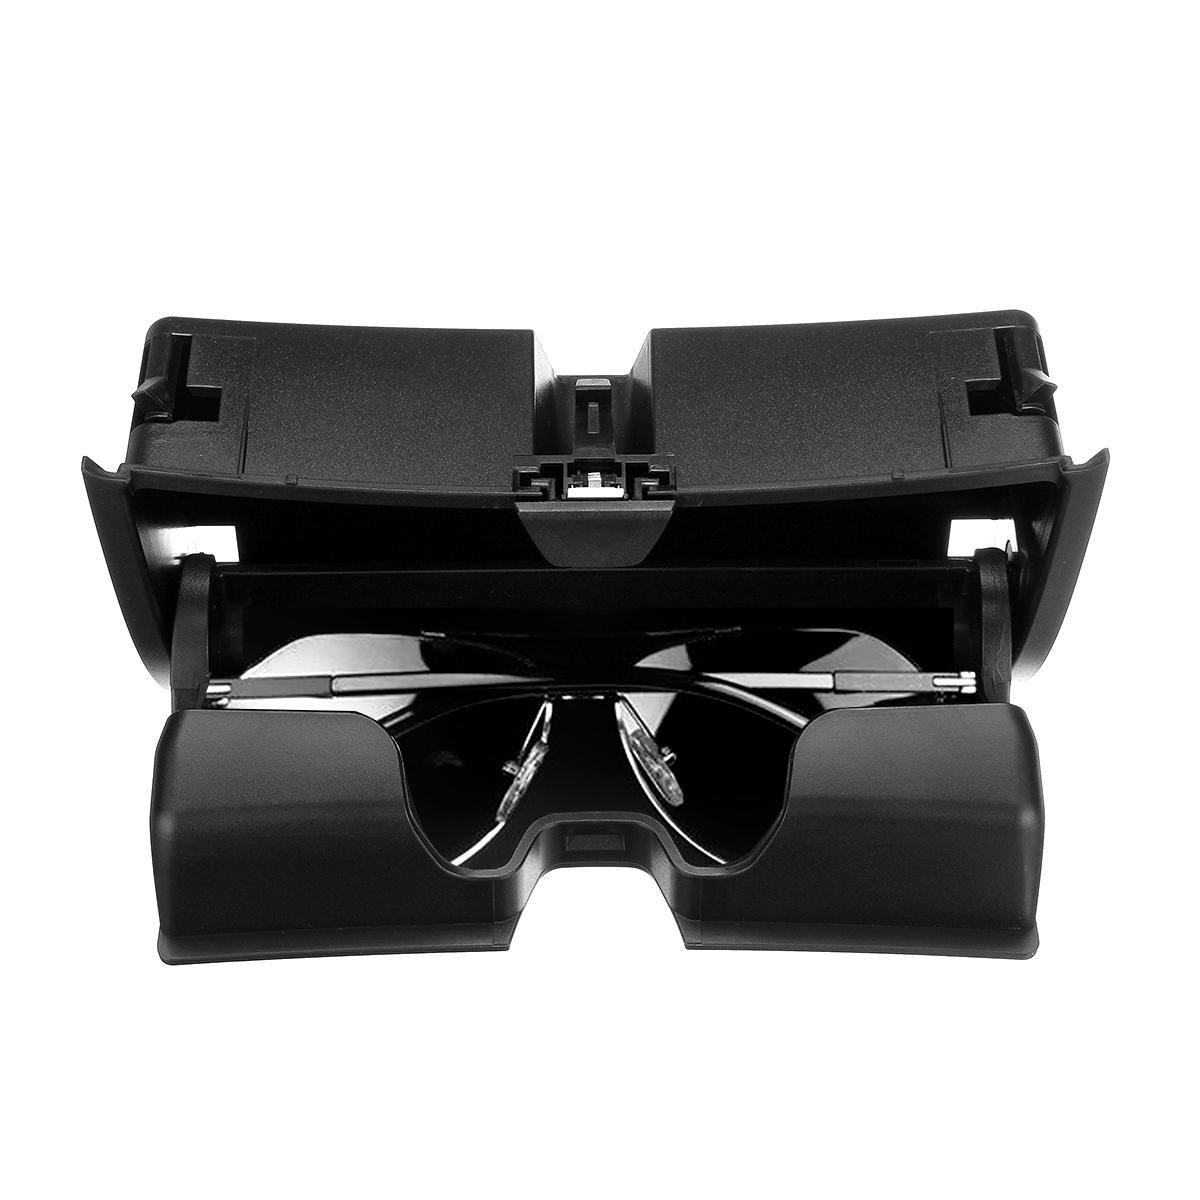 Car Front Sun Glasses Case Box Organizer Holder Plastic Storage Box for BMW X5 X6 F15 F16 2014 2017